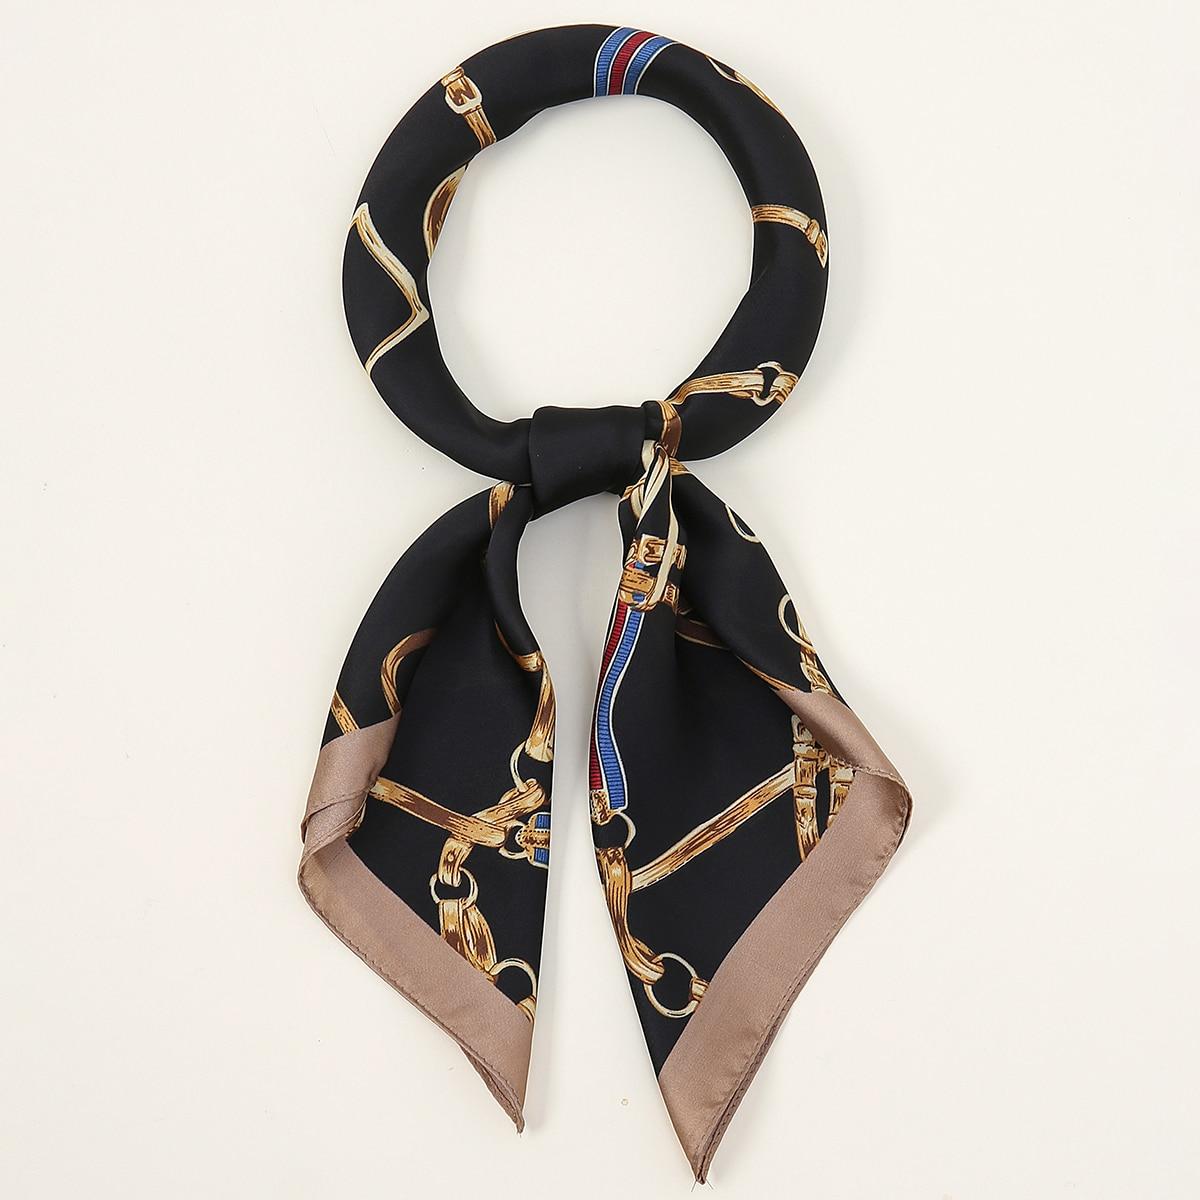 shein Riempatroon sjaal